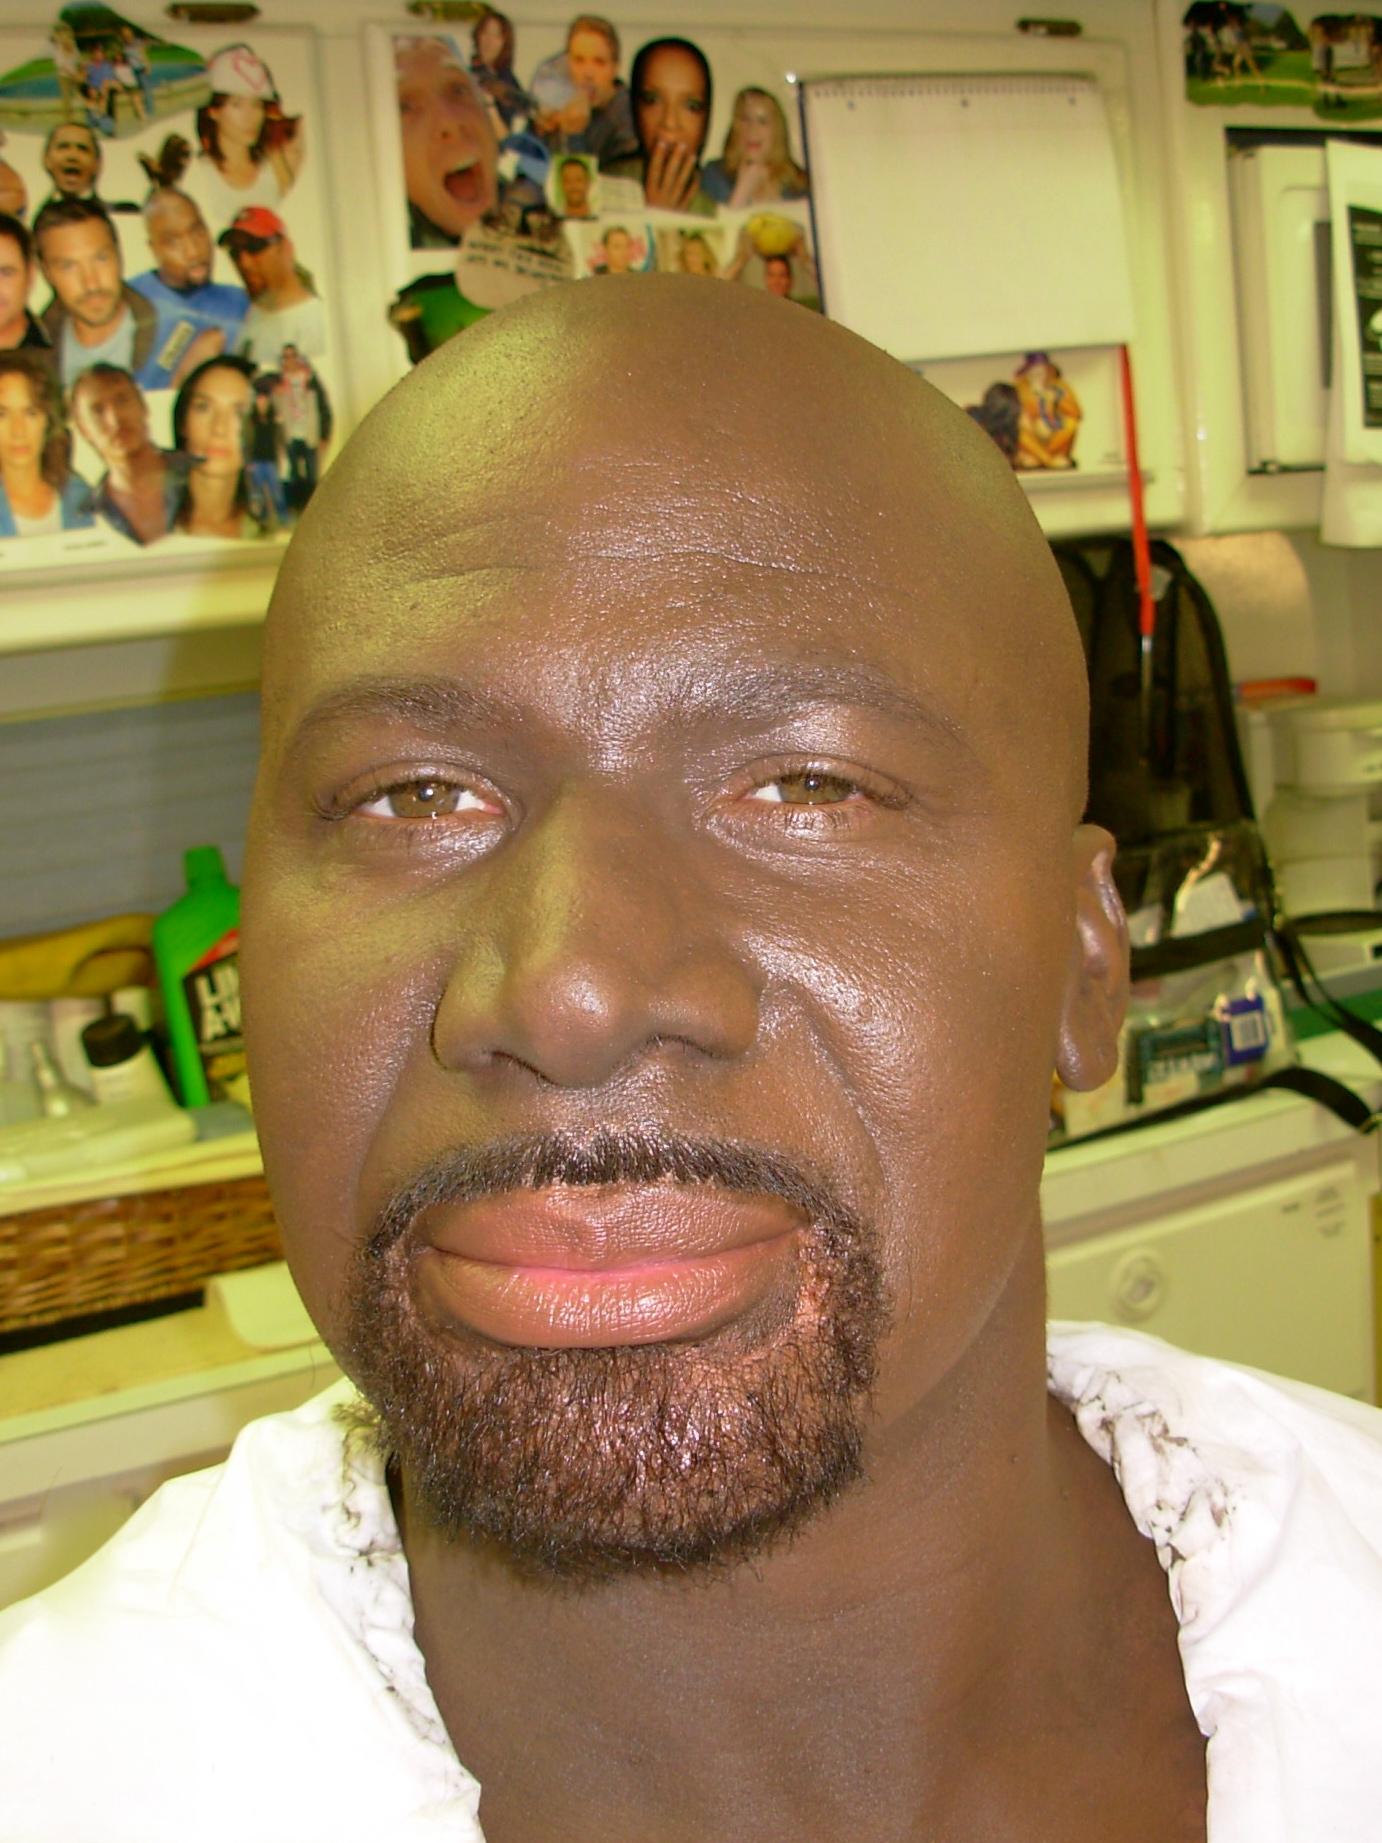 Brennan After racial modification